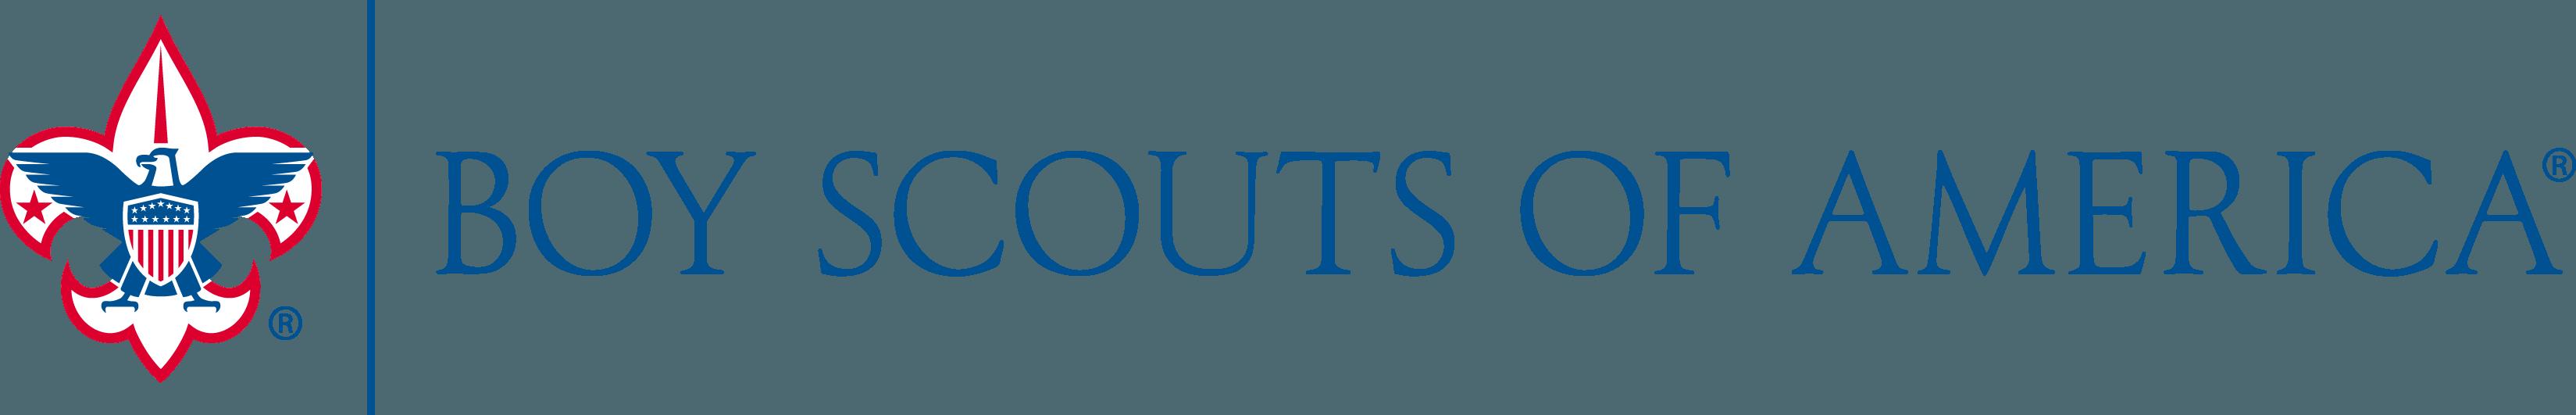 BSA Logo (Boy Scouts of America)